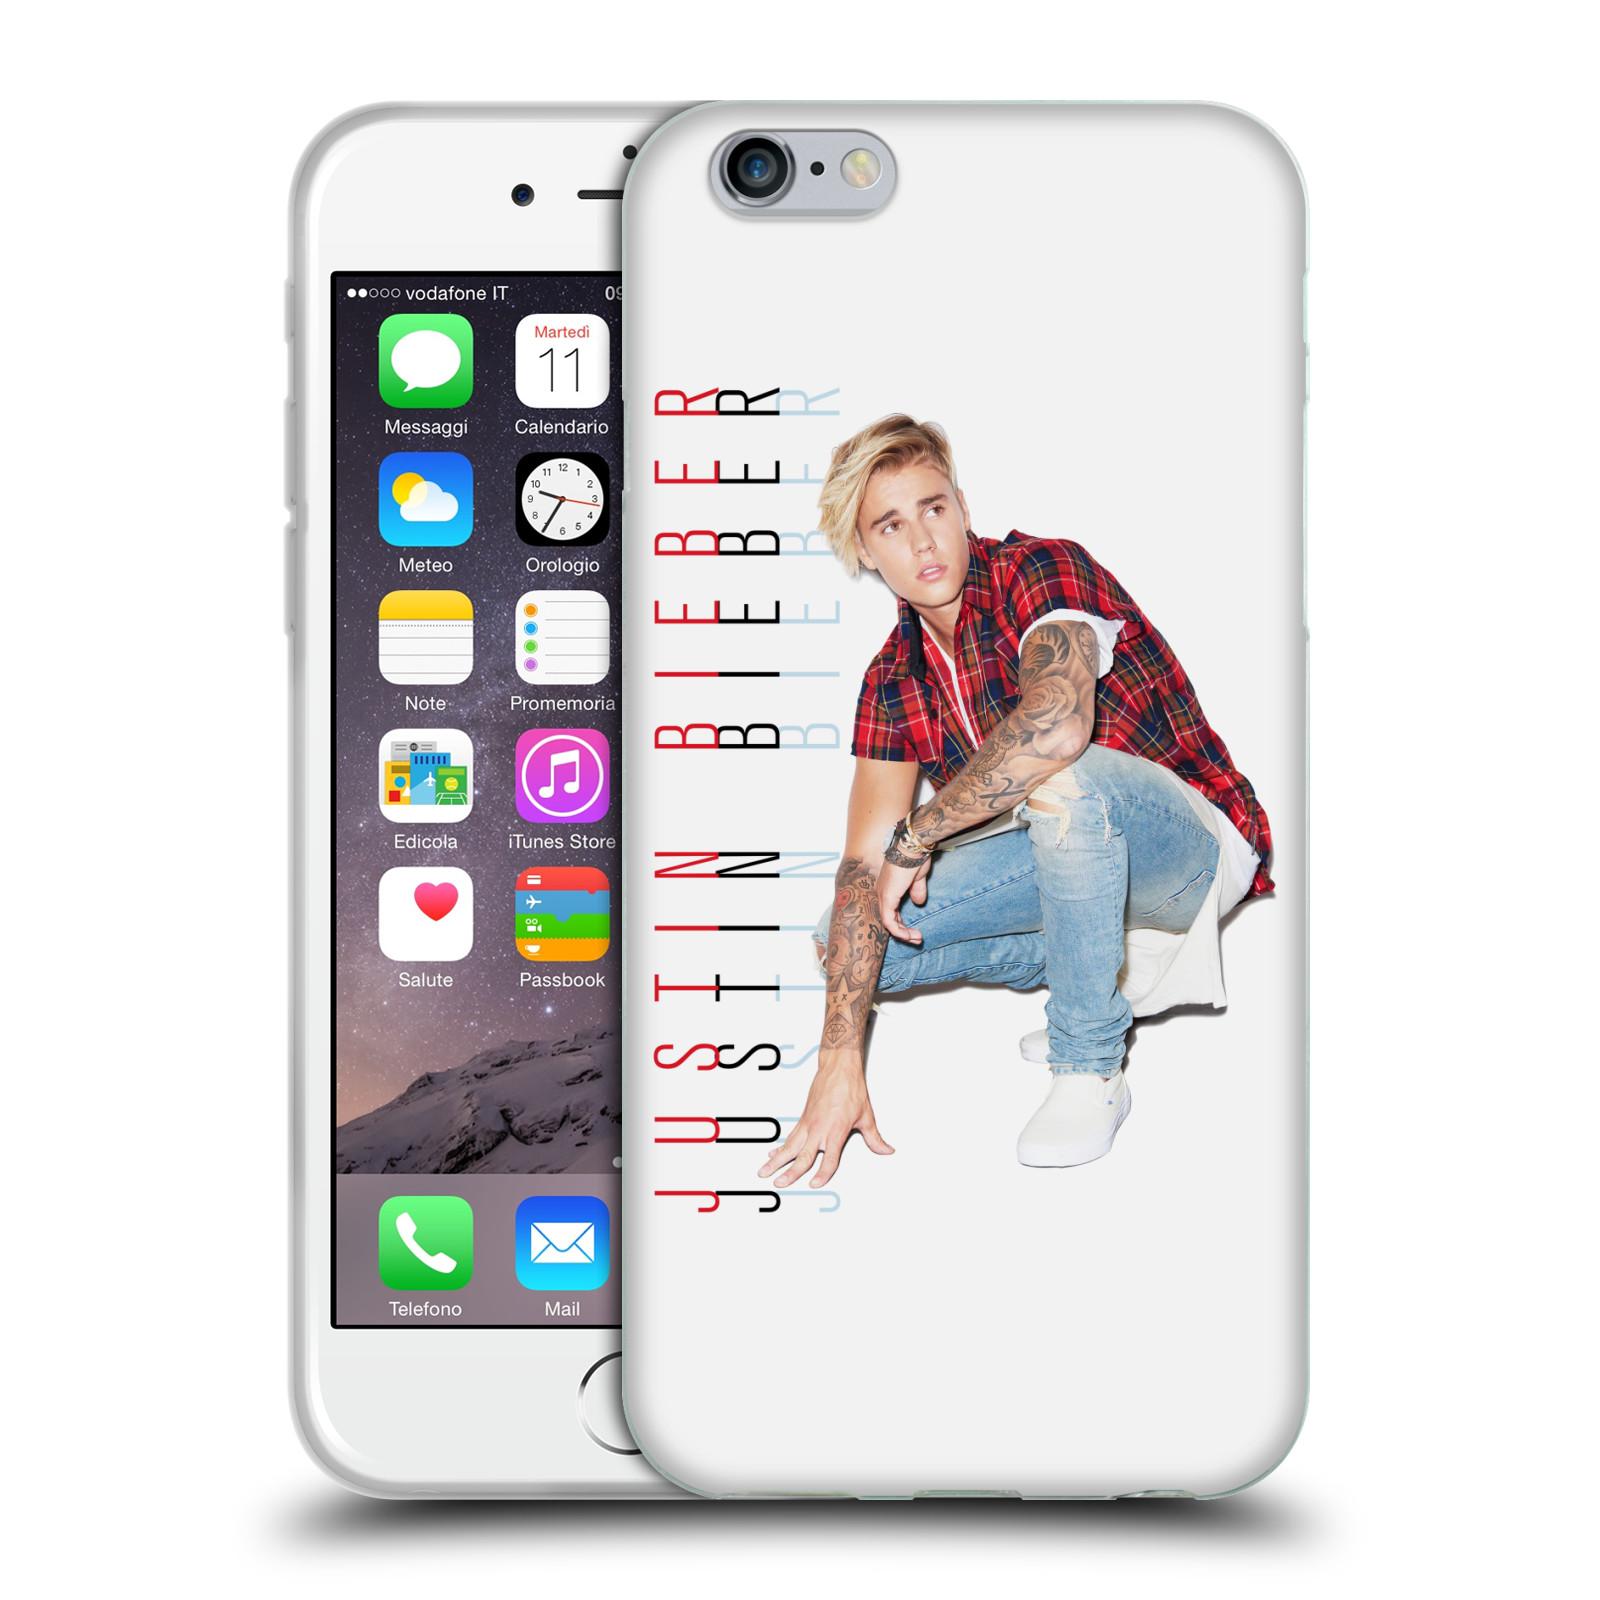 OFFICIAL-JUSTIN-BIEBER-KEY-ART-SOFT-GEL-CASE-FOR-APPLE-iPHONE-PHONES